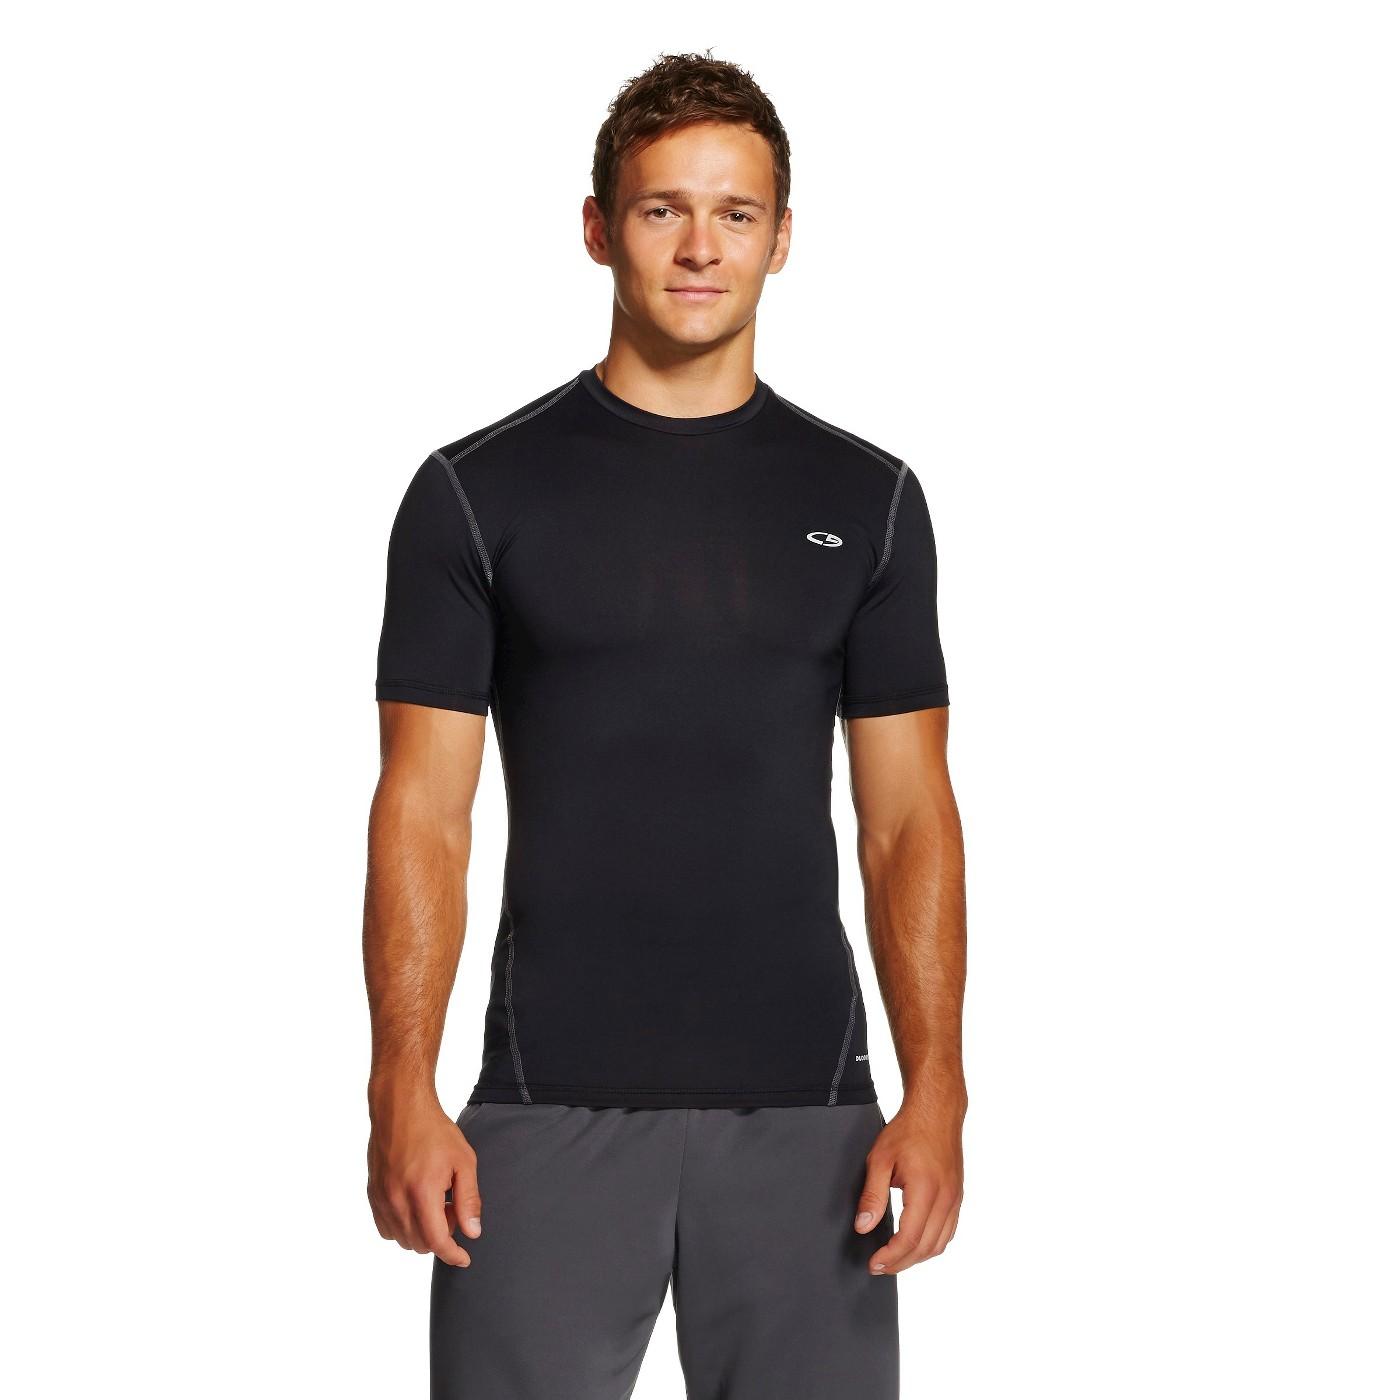 Man models black compression shirt.